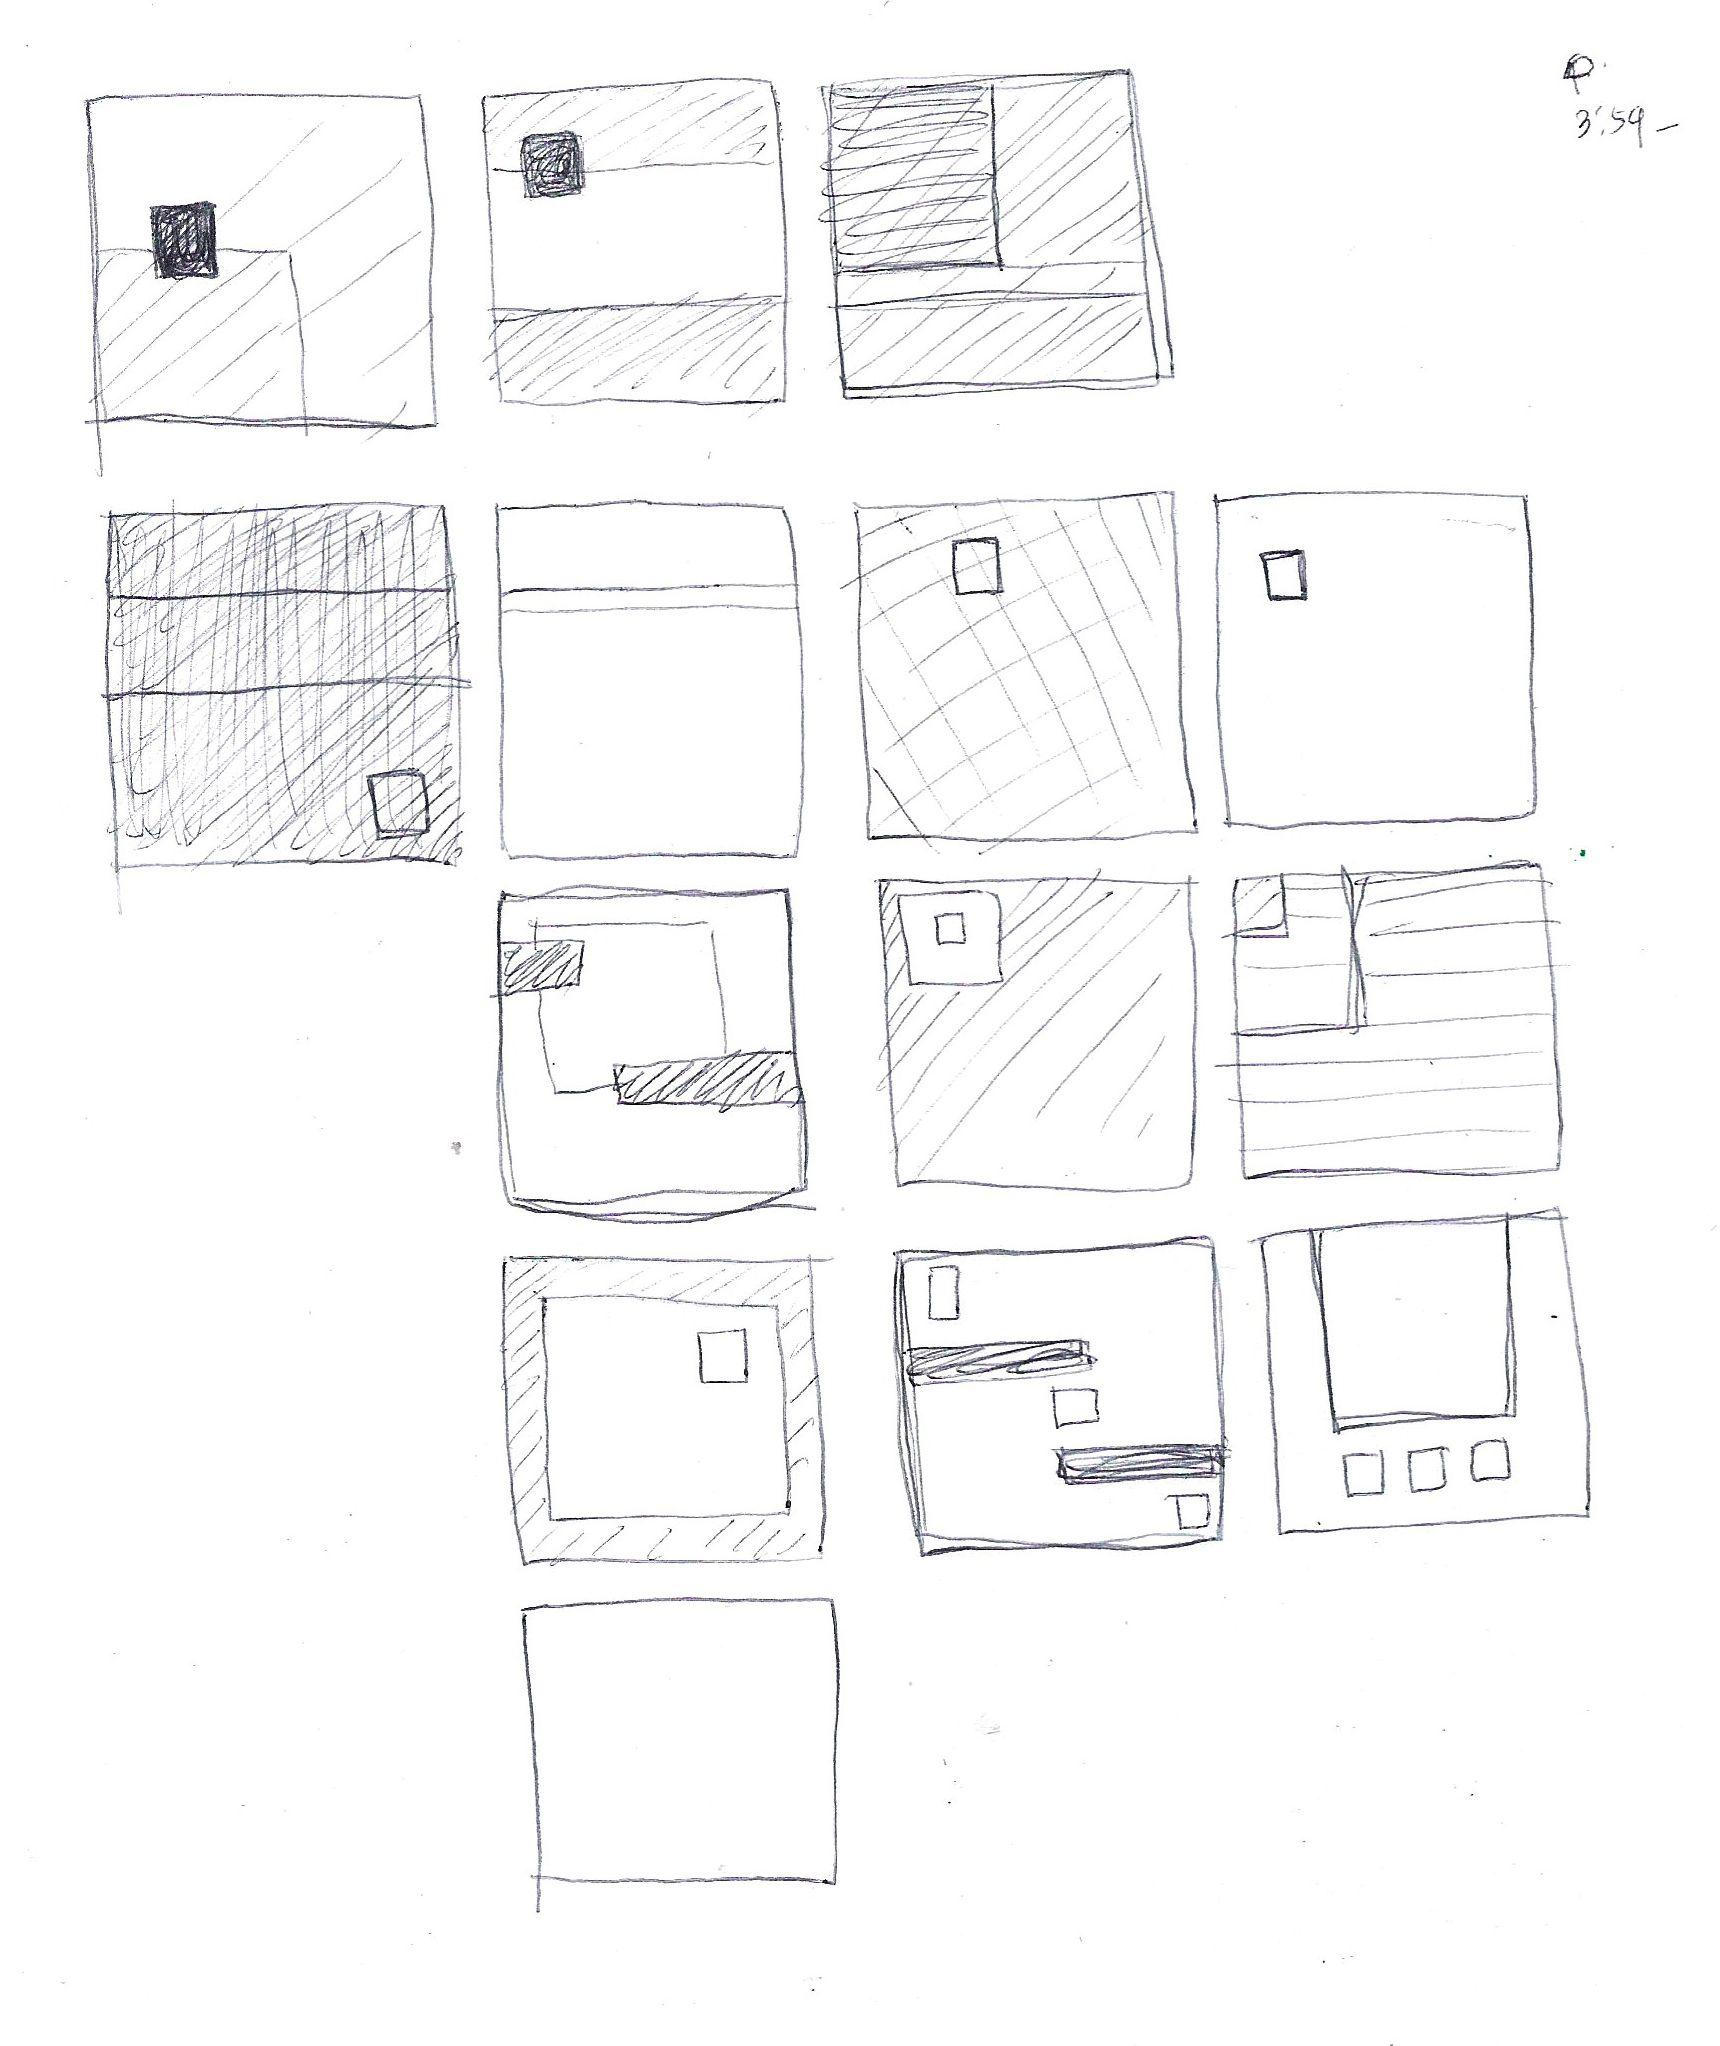 e213 w1 조예슬 04 스케치